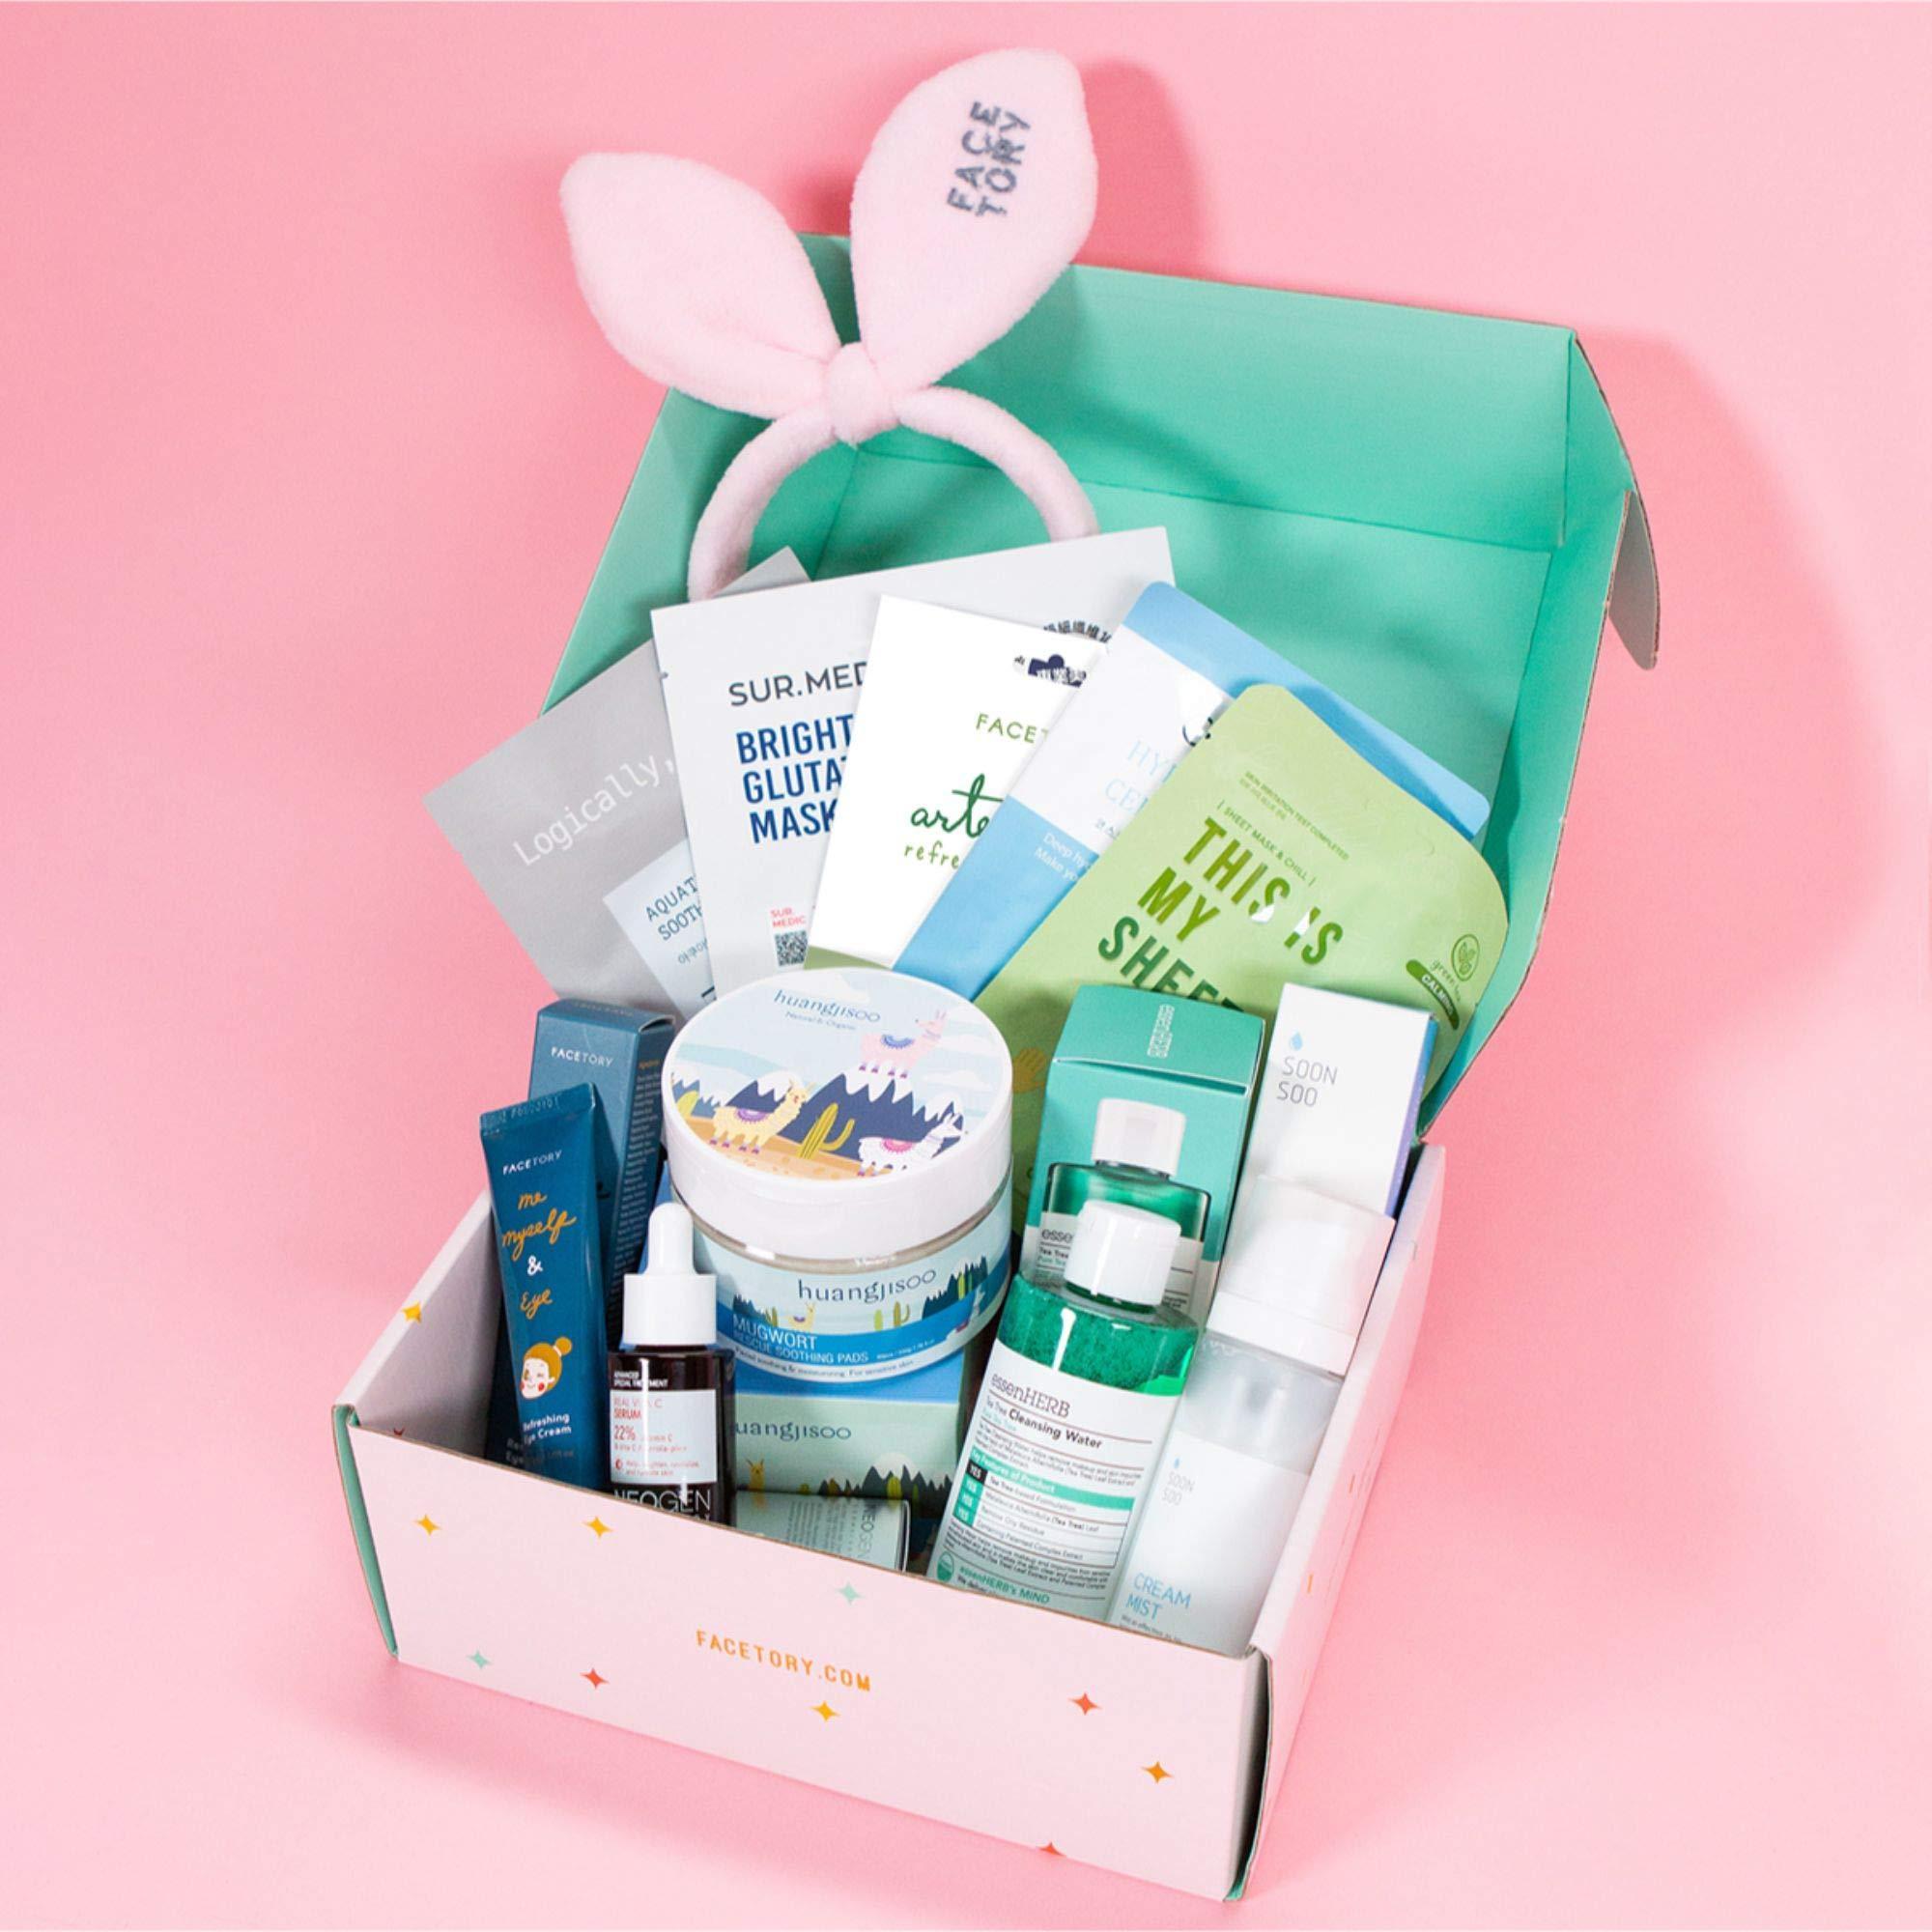 FaceTory K-Beauty Subscription Box